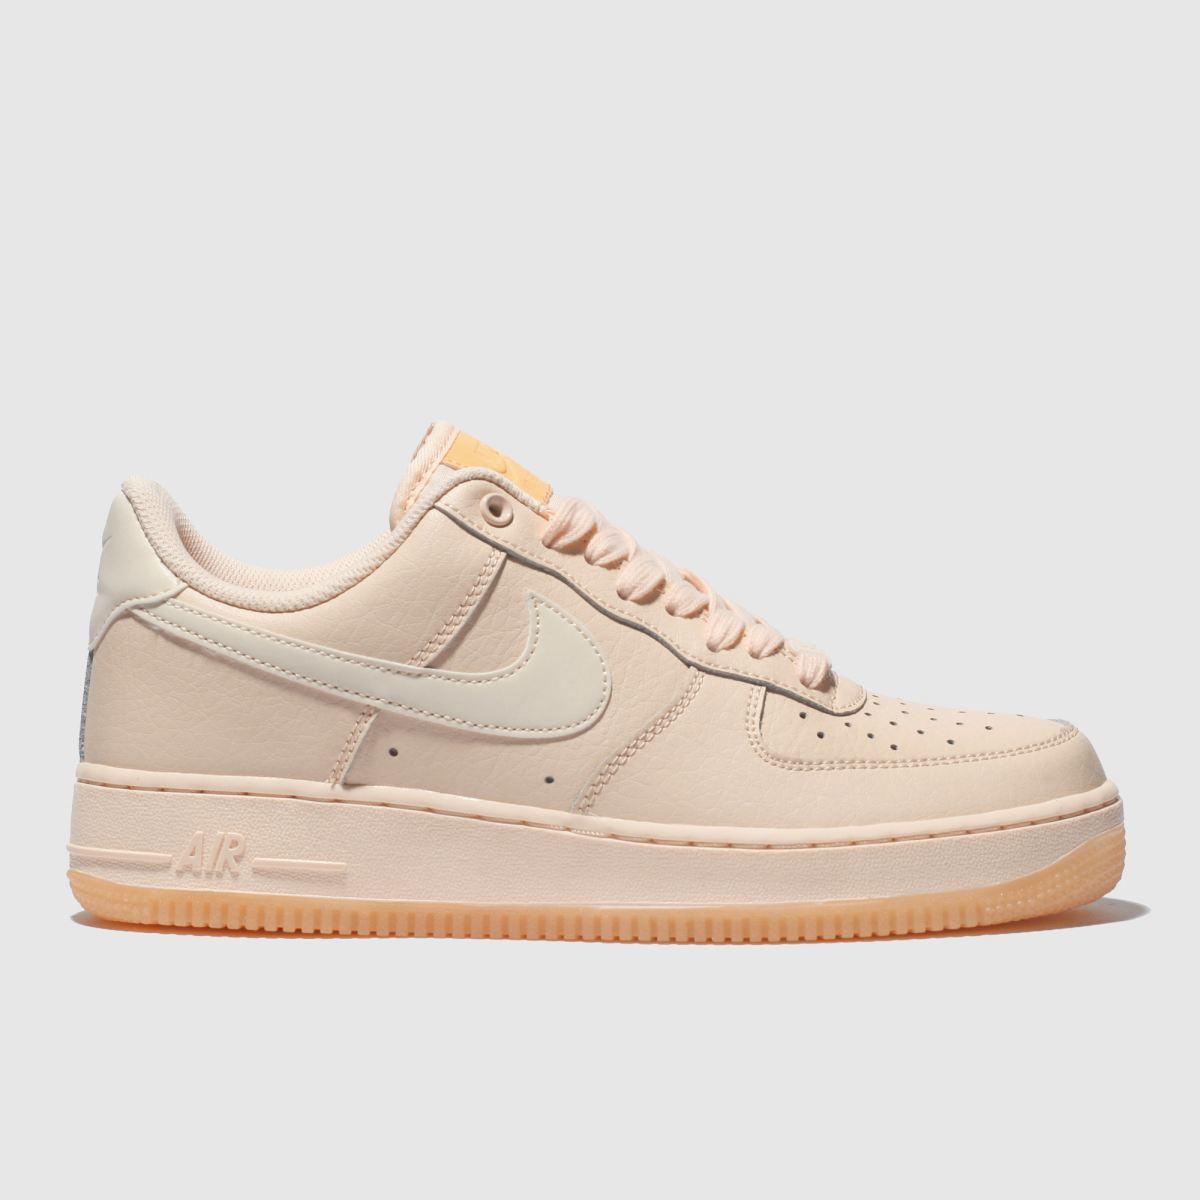 Nike Peach Air Force 1 07 Essential Trainers